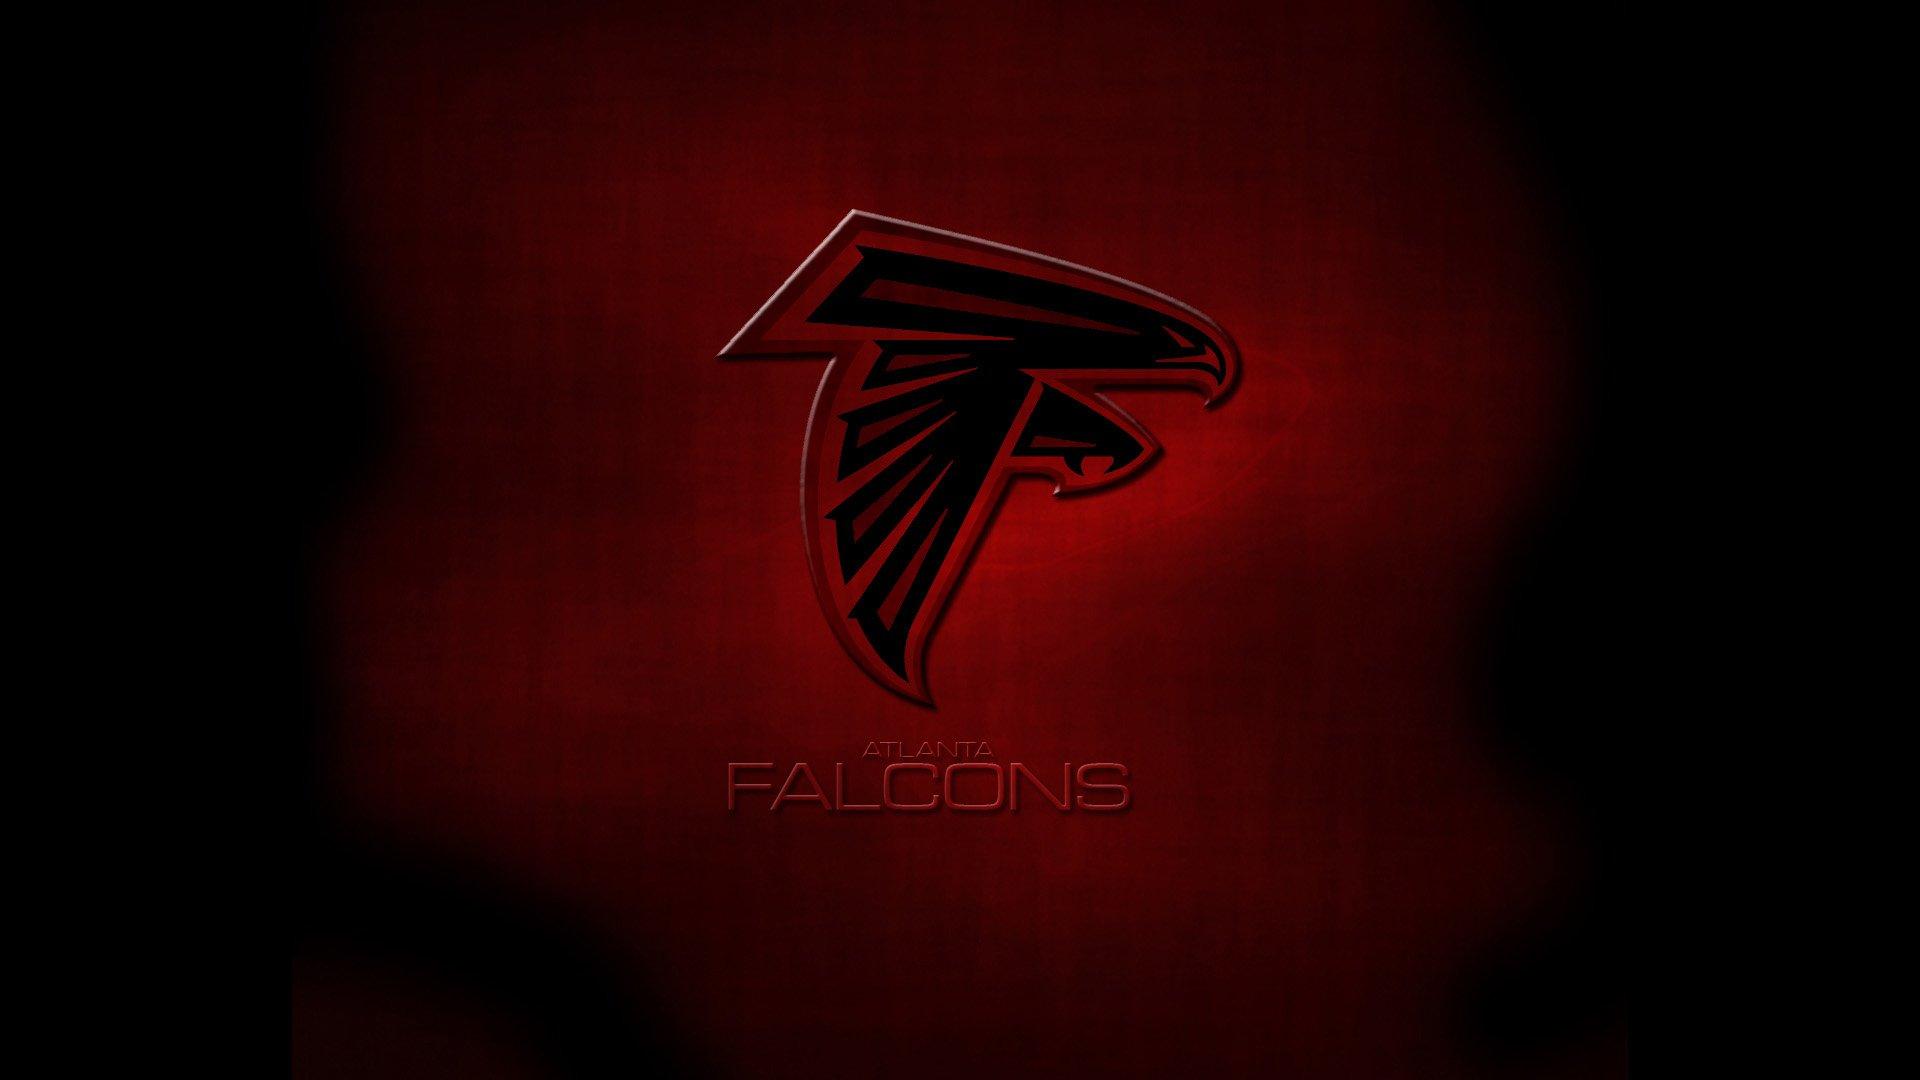 Atlanta Falcons Wallpaper Download Free Cool Full Hd: Atlanta Falcons HD Wallpaper